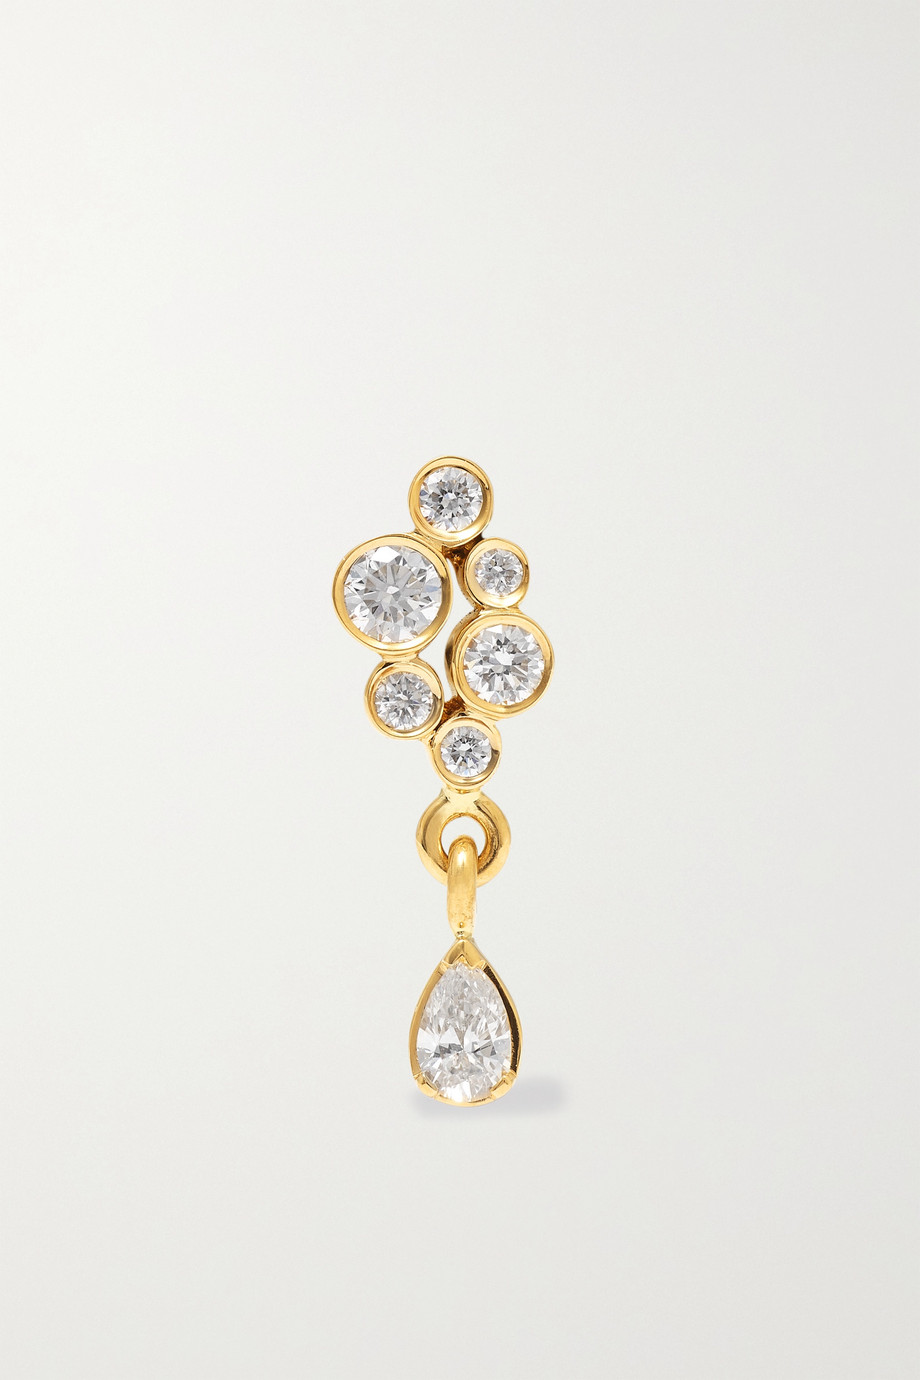 Sophie Bille Brahe Petite Splash 18-karat gold diamond single earring